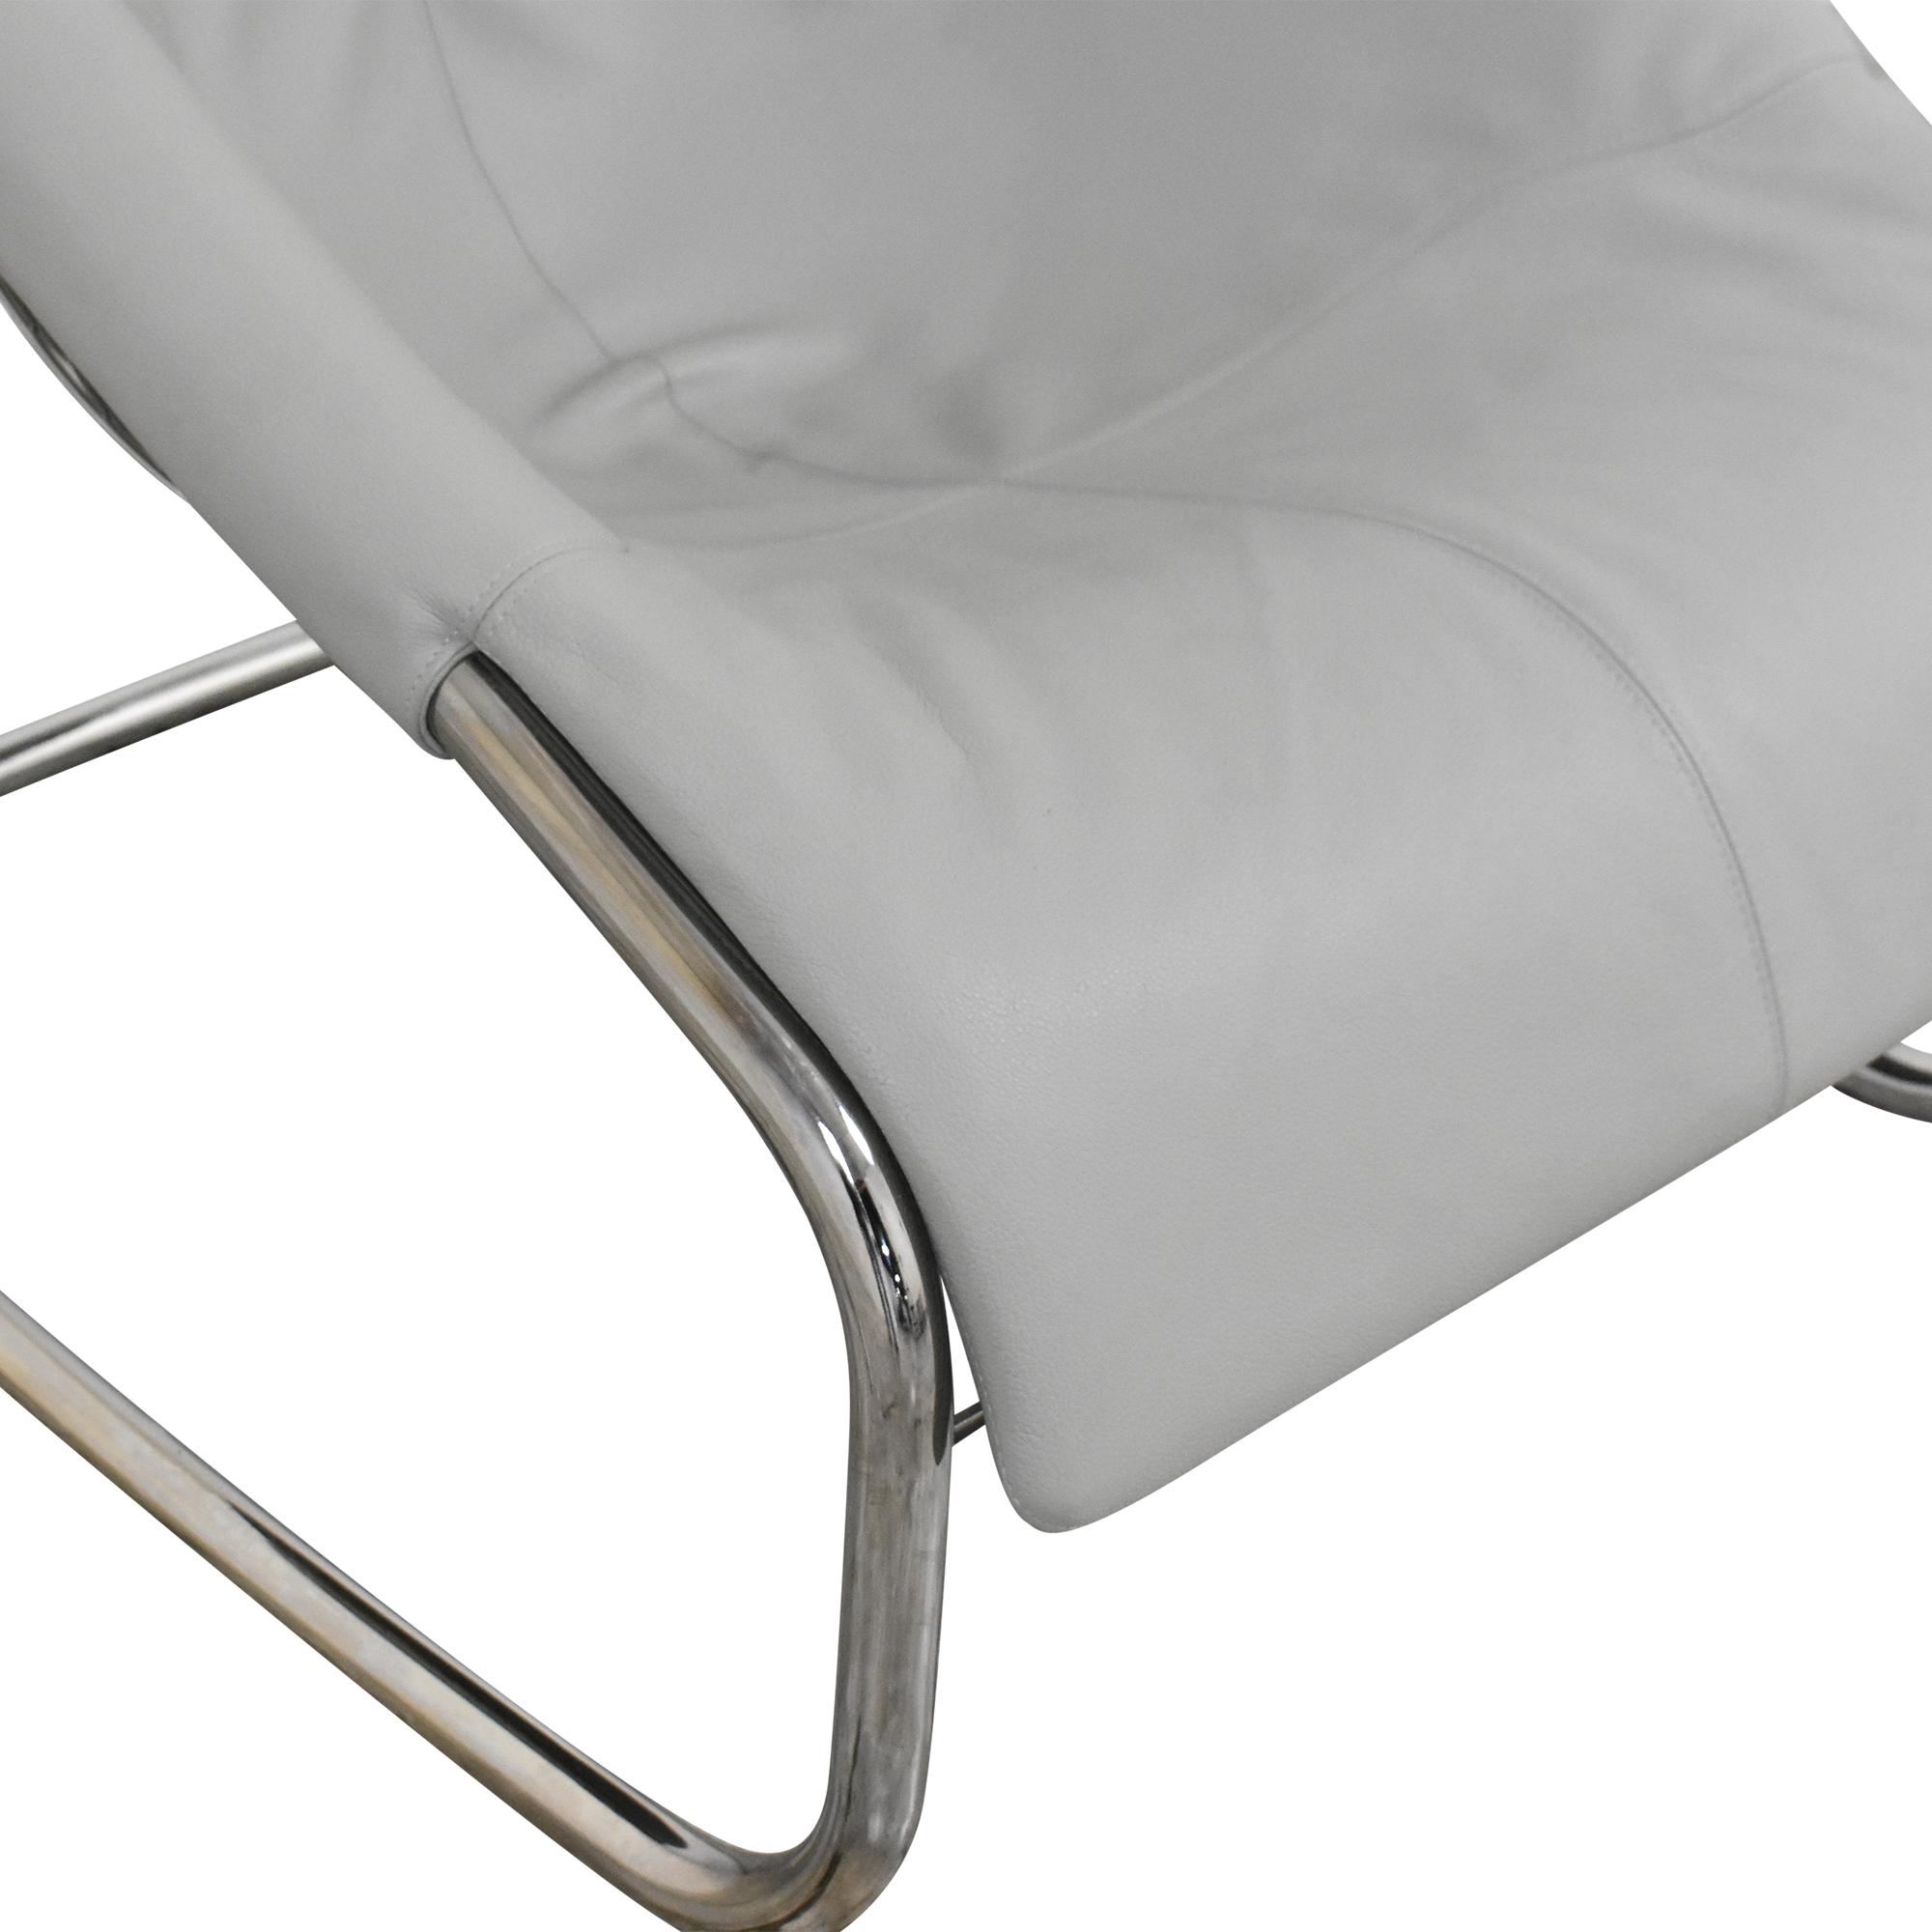 Minotti Minotti Cortina Armchair for sale